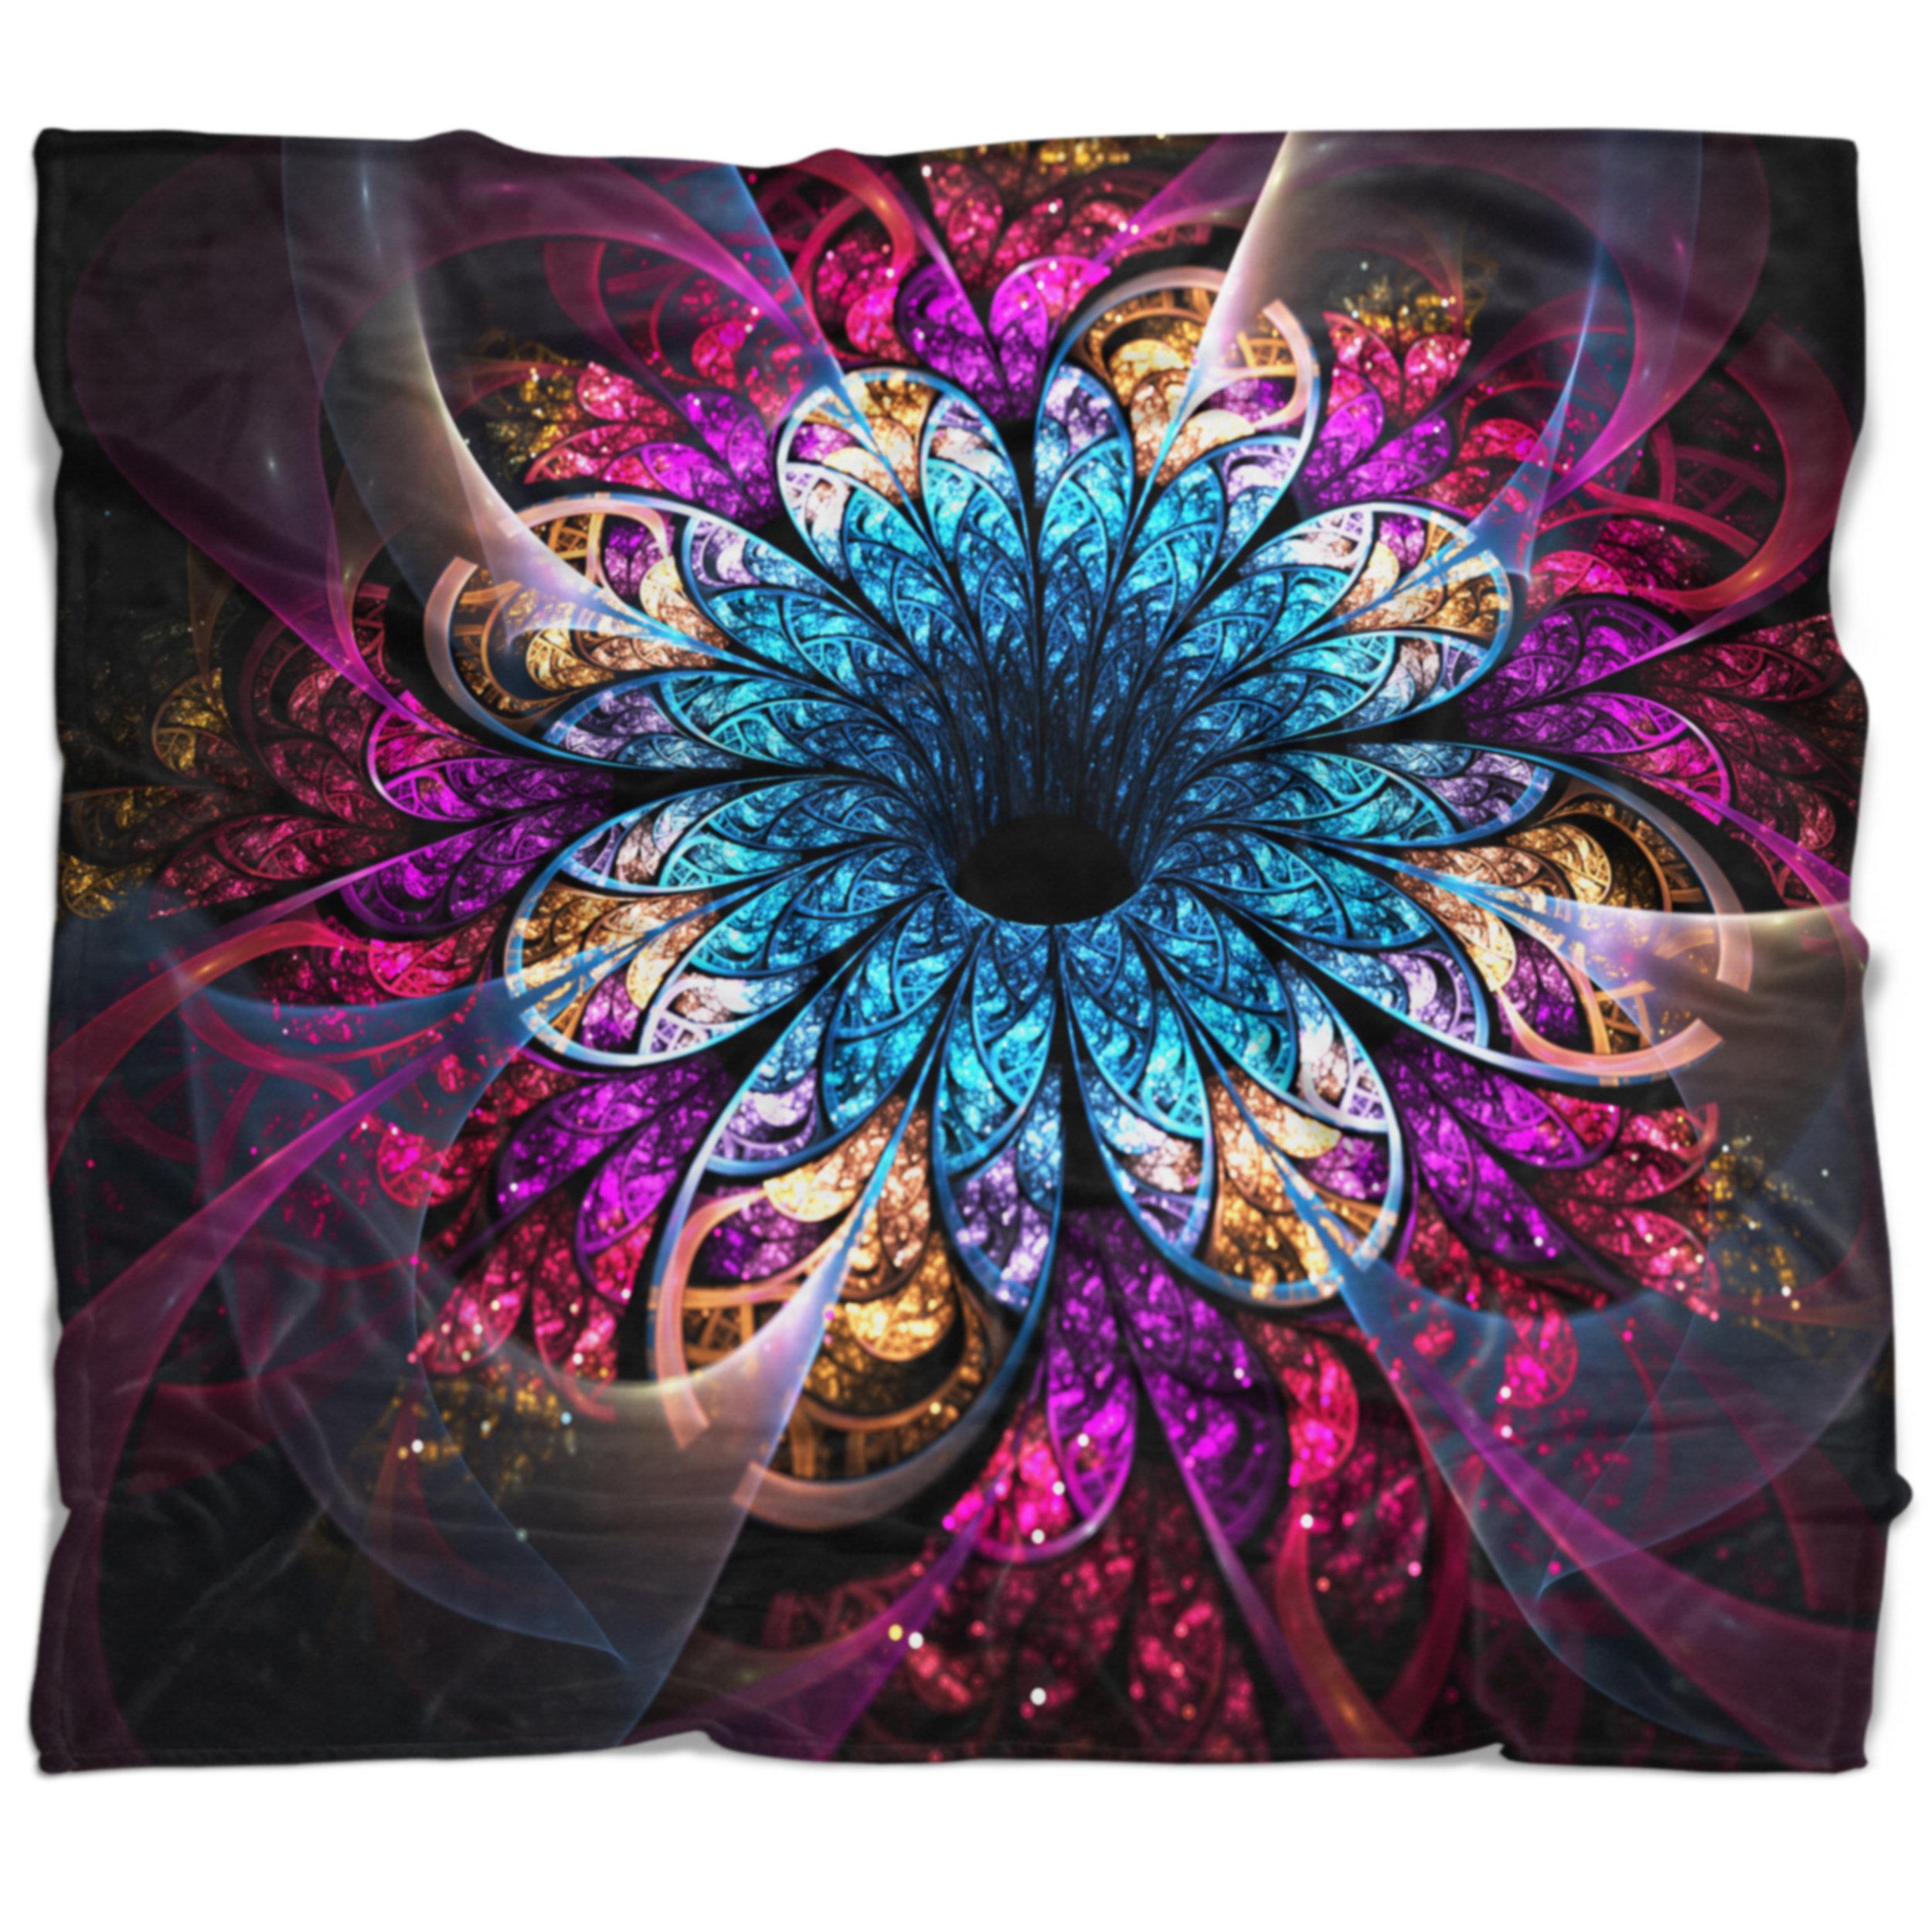 East Urban Home Flower Fractal Digital Art Blanket Wayfair